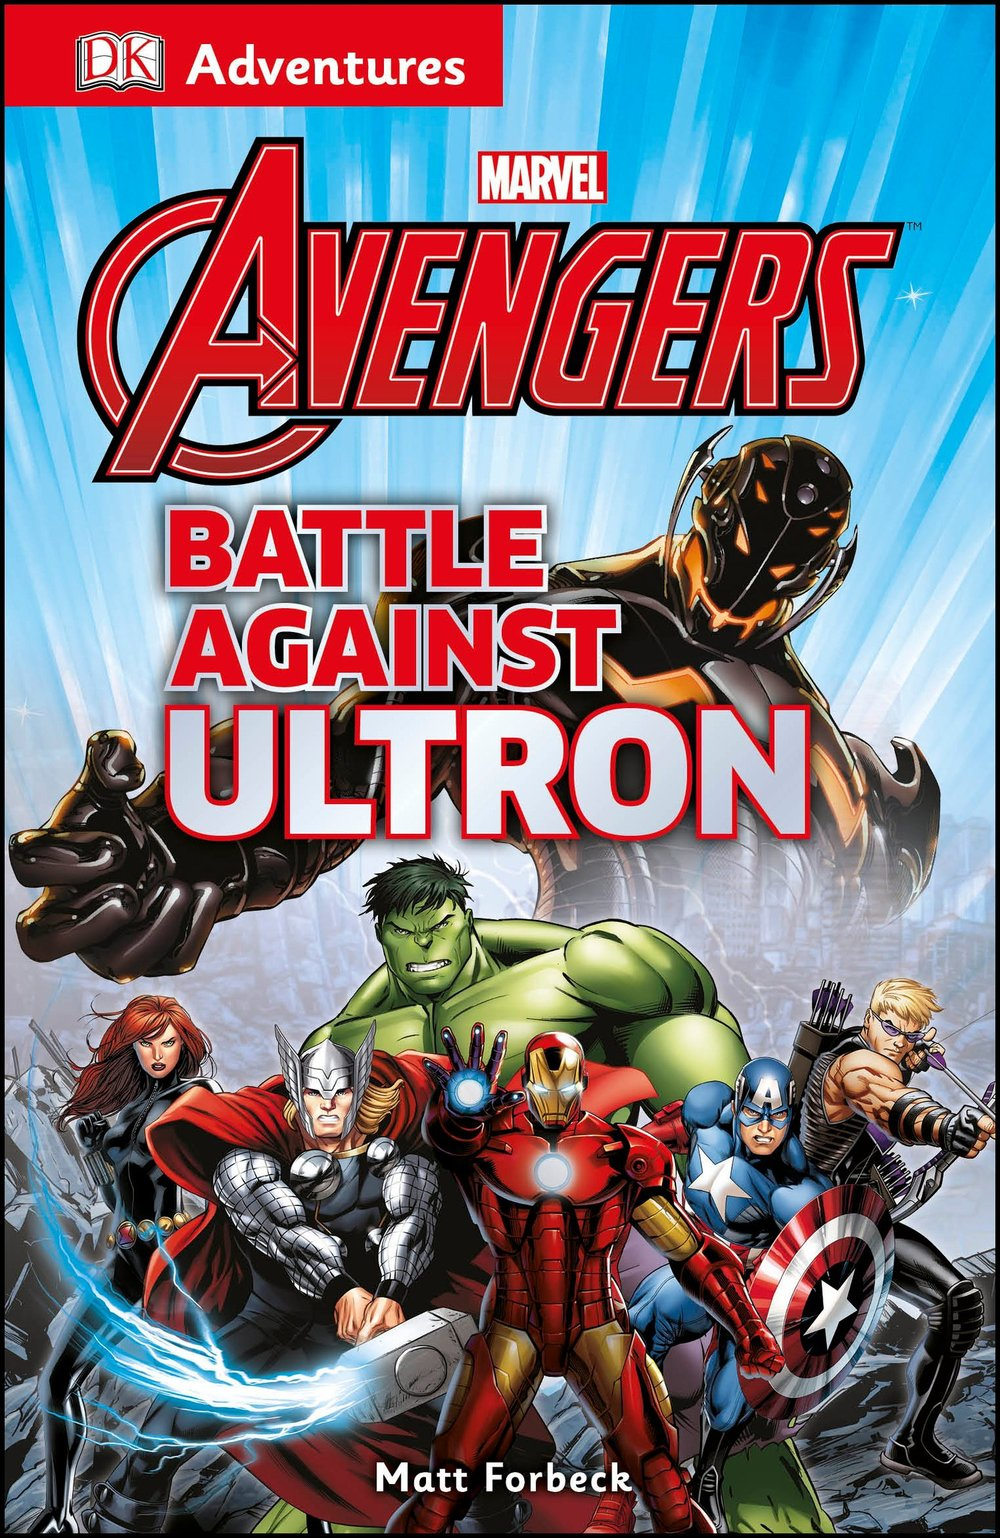 DK_Adventures_Avengers_Ultron.jpg